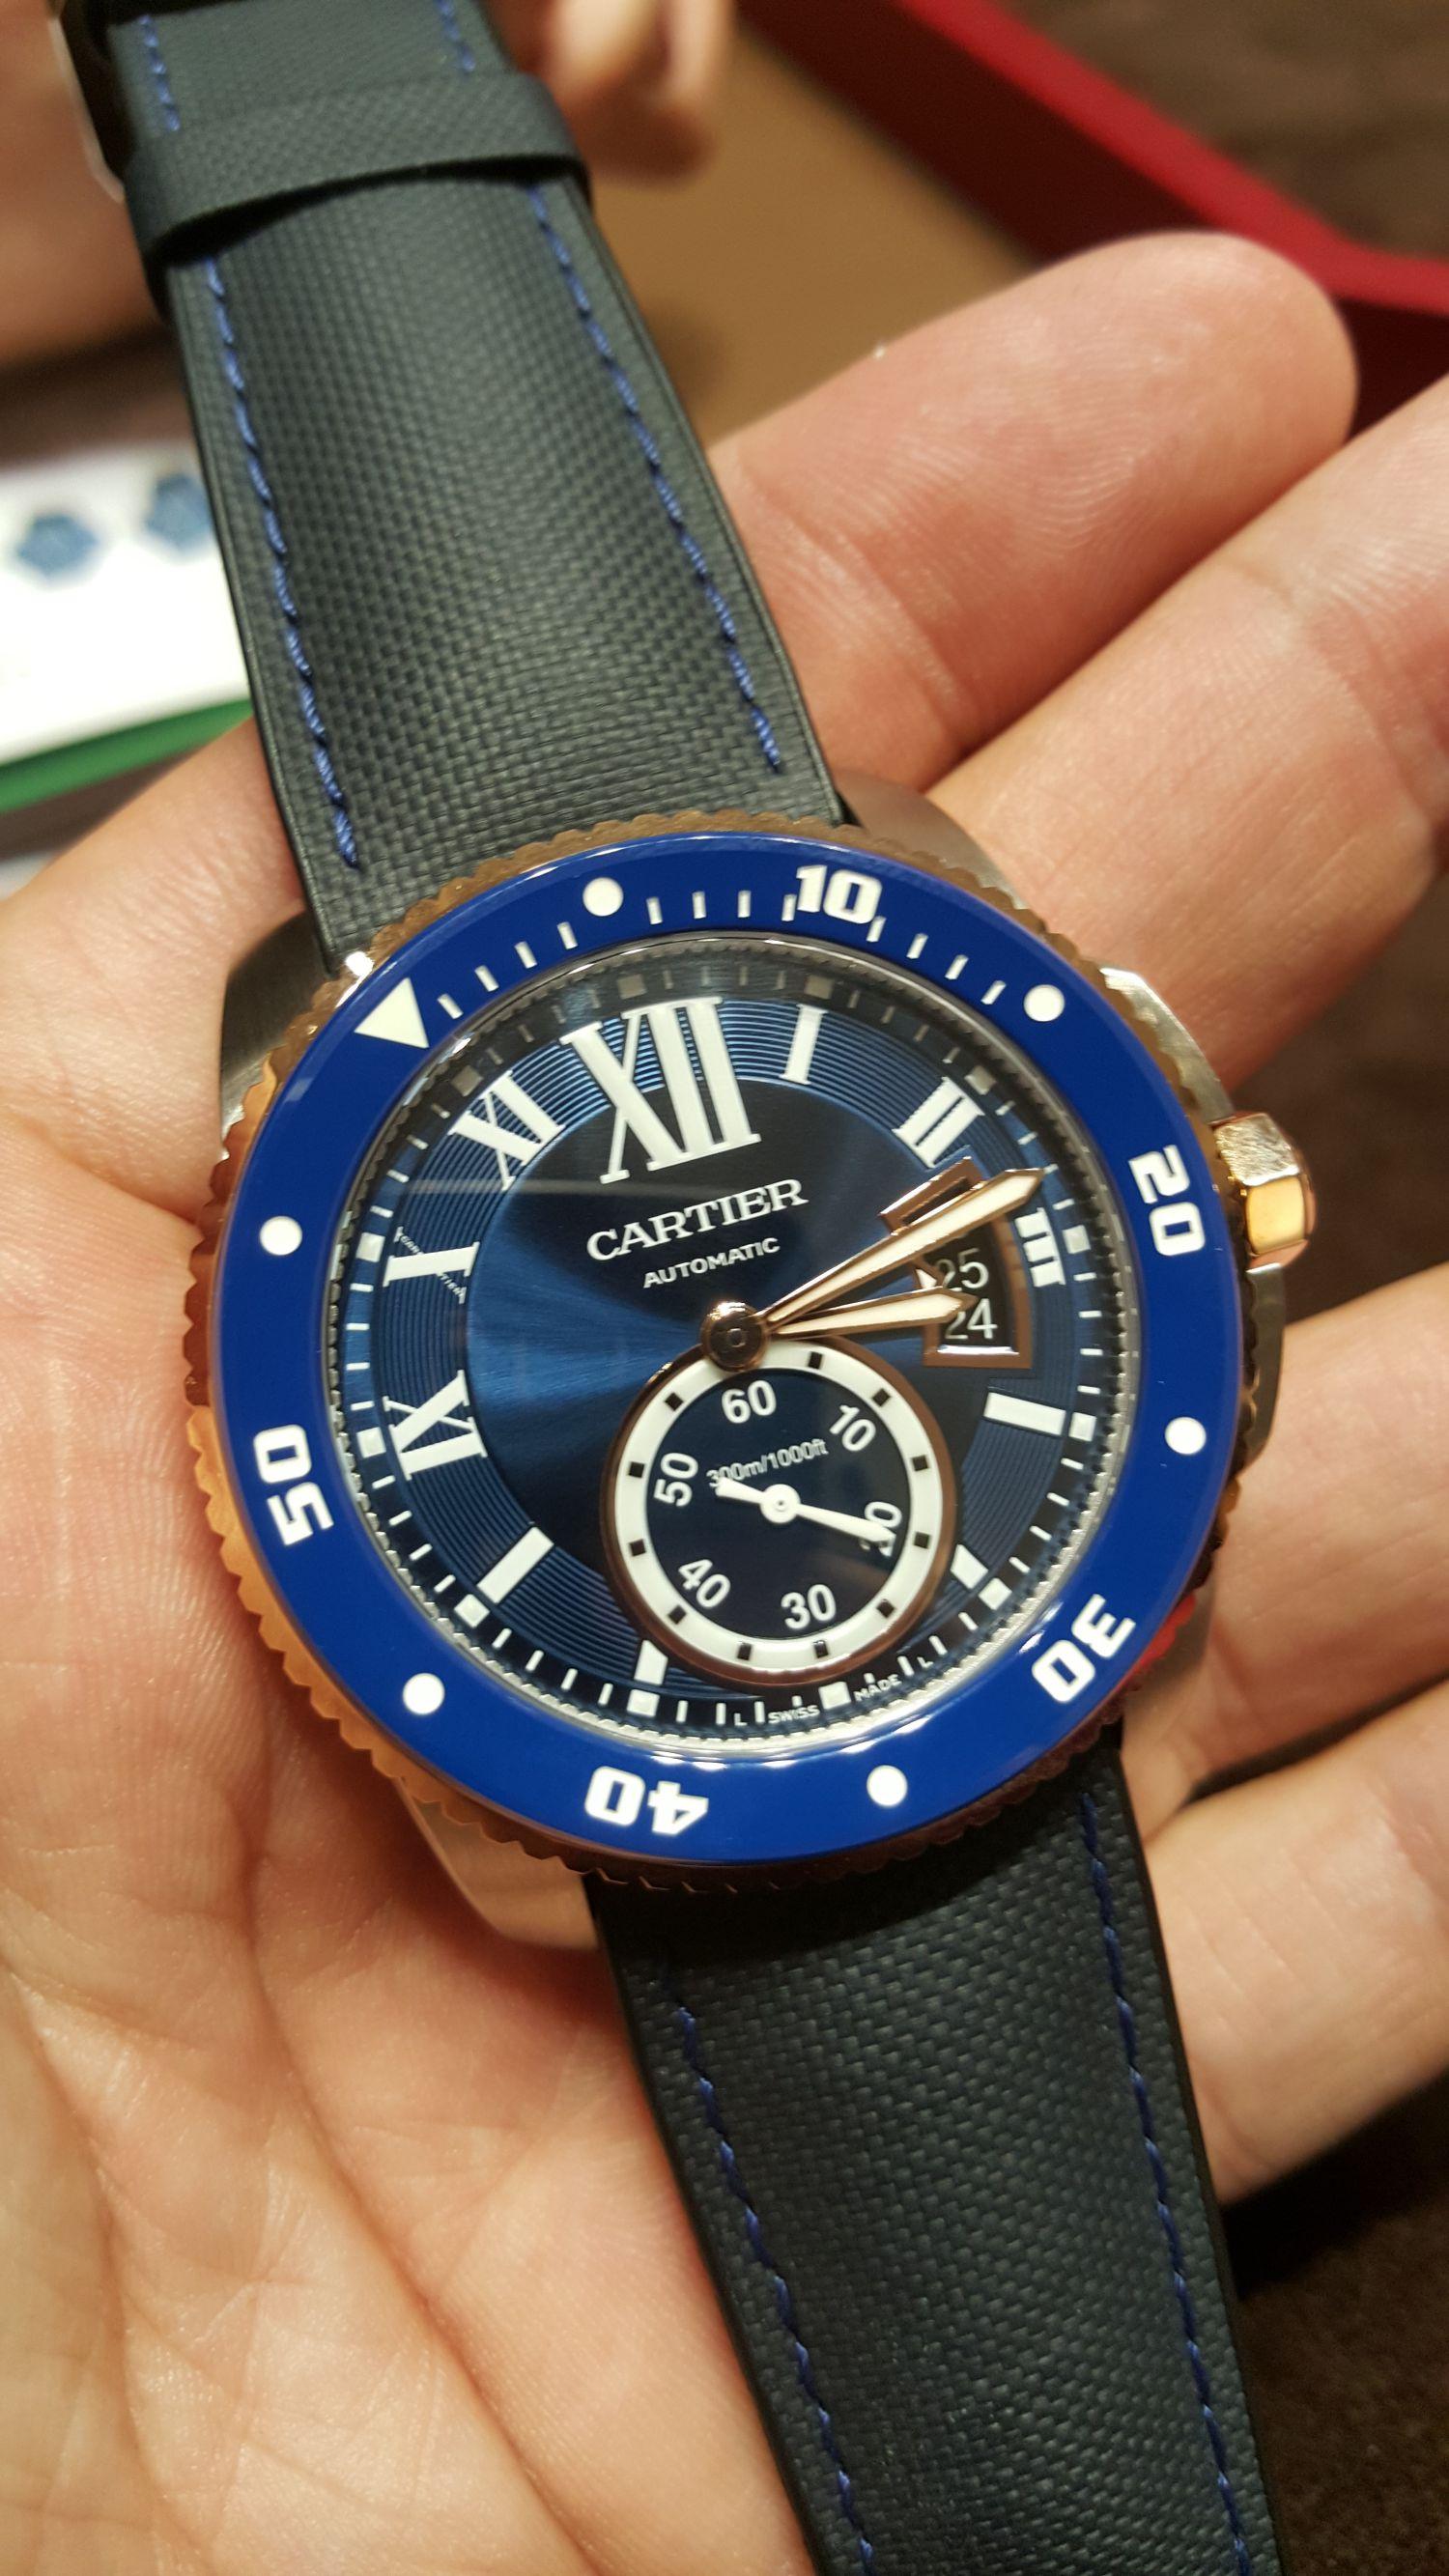 Calibre-De-Cartier-Diver-Blue-Sihh-2016-1.jpg